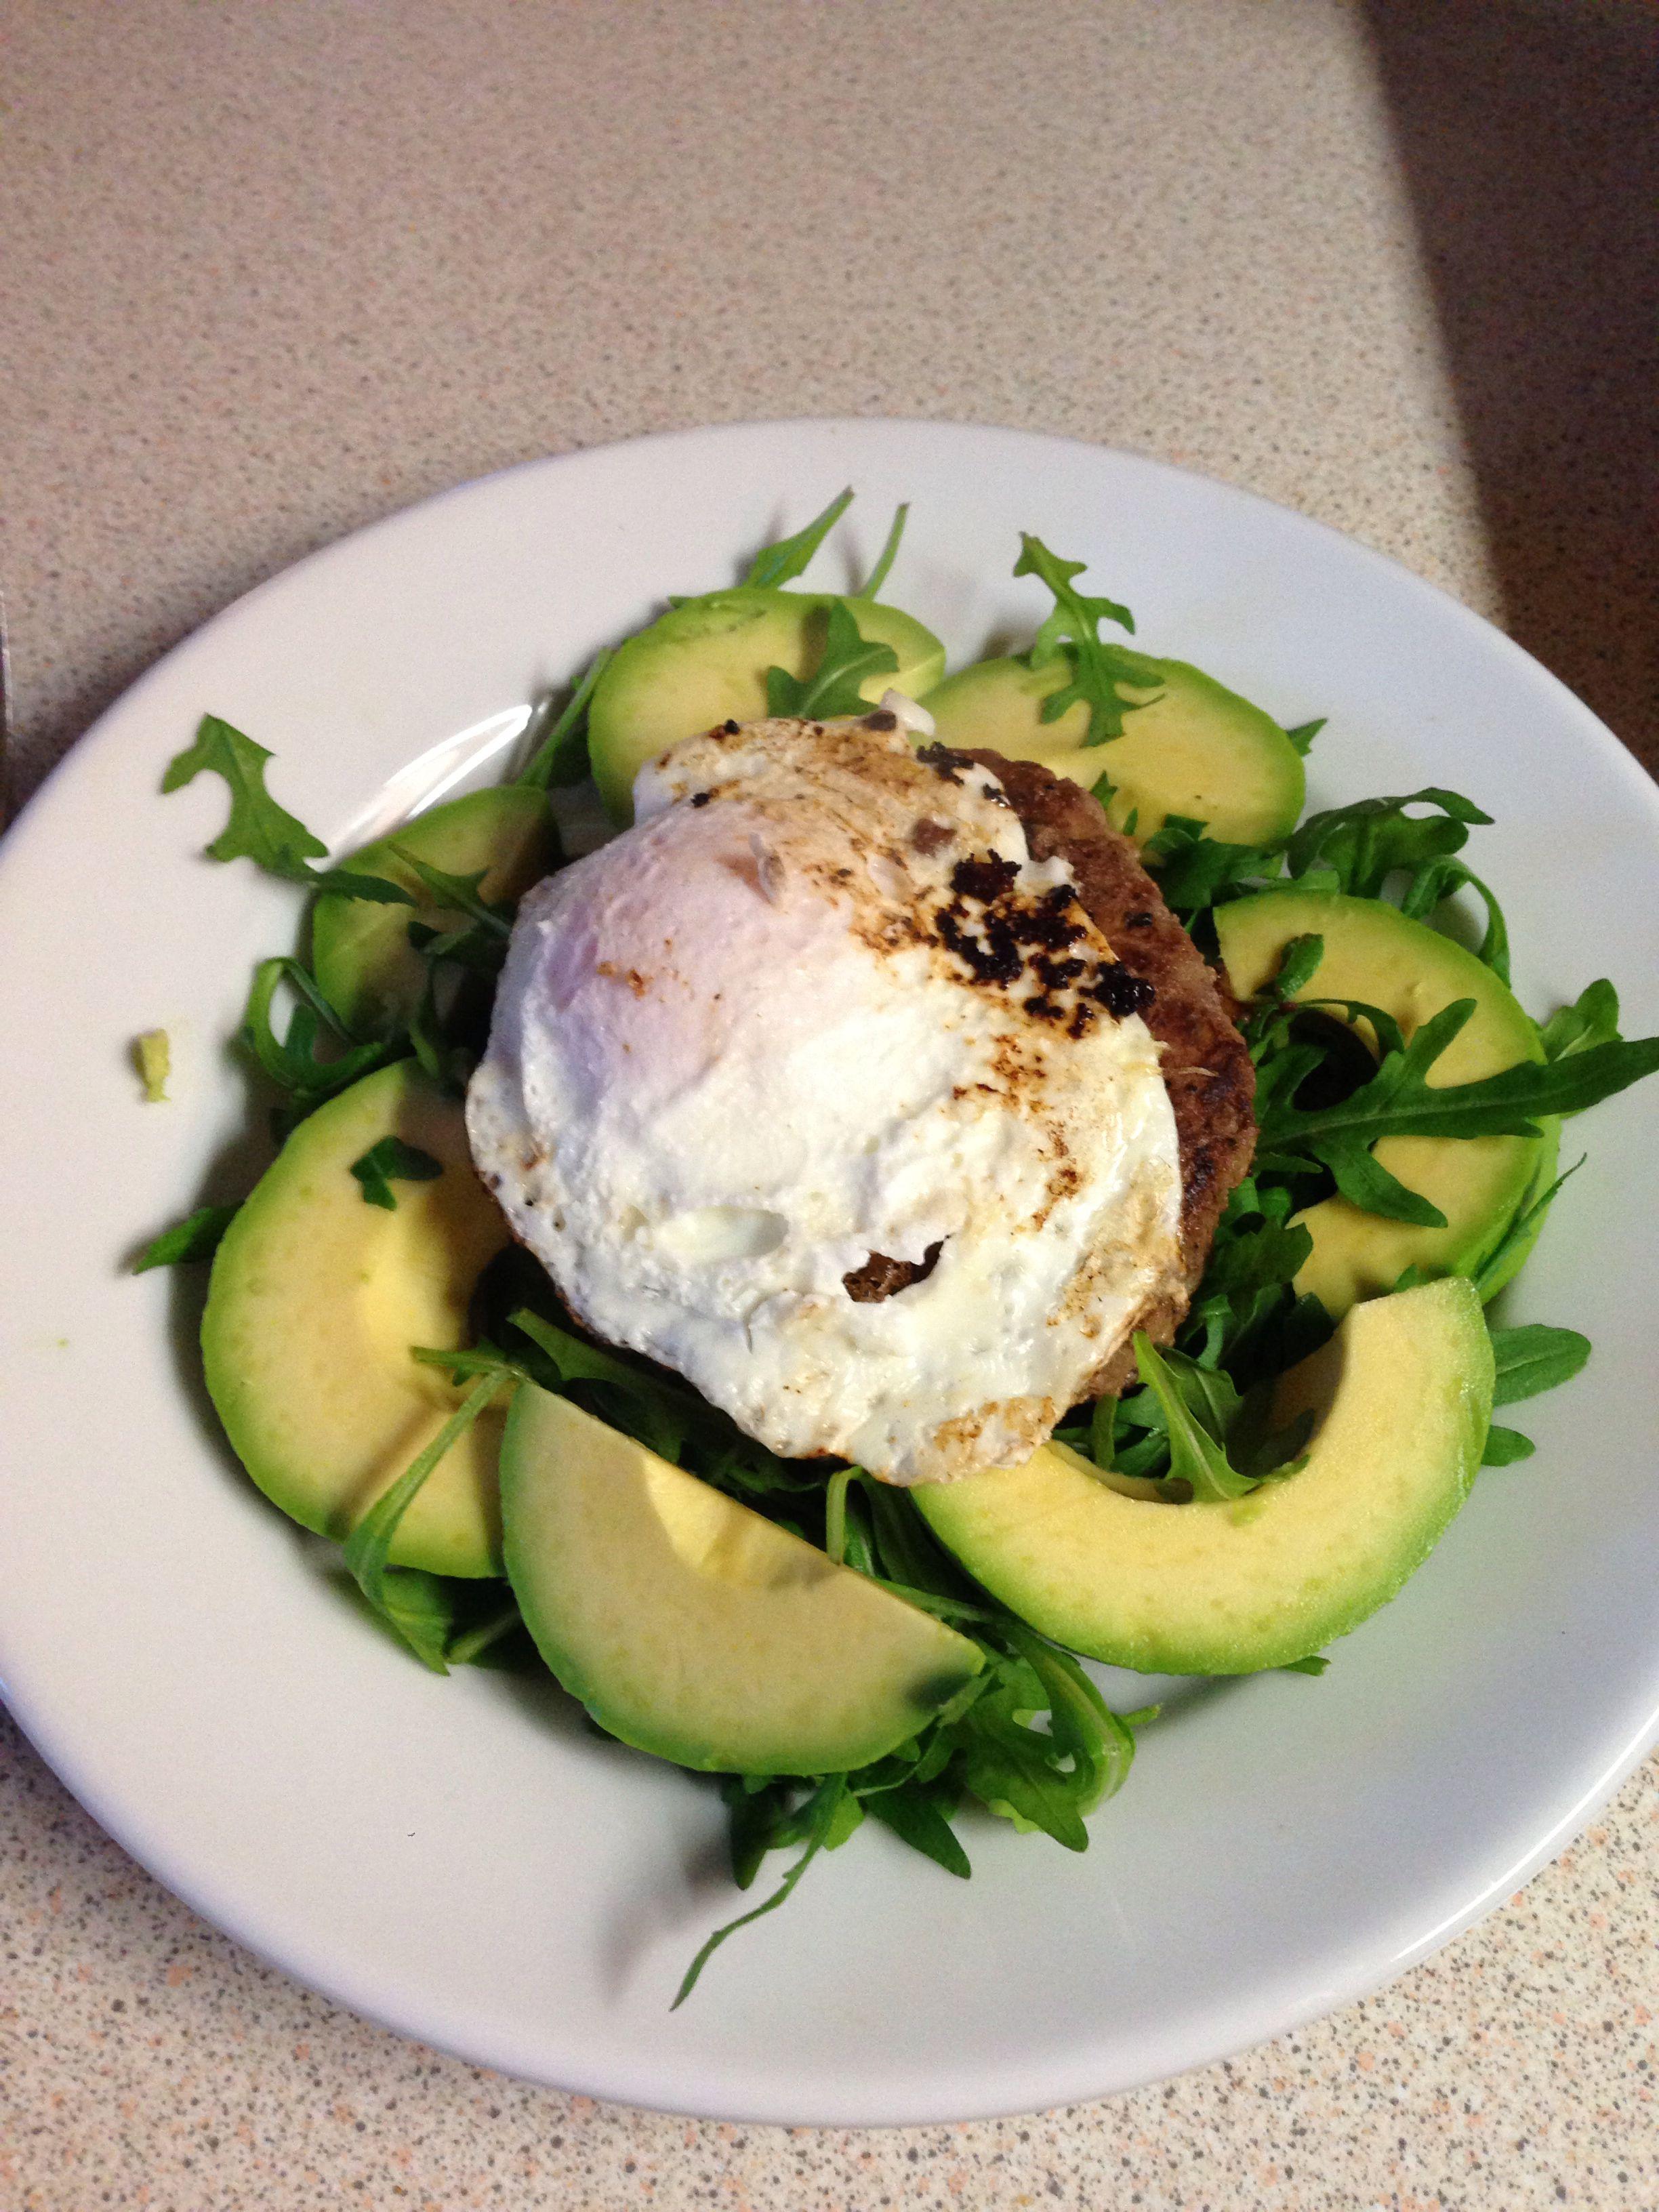 Leanin15 burger, avocado & egg   Workout food, Healthy ...